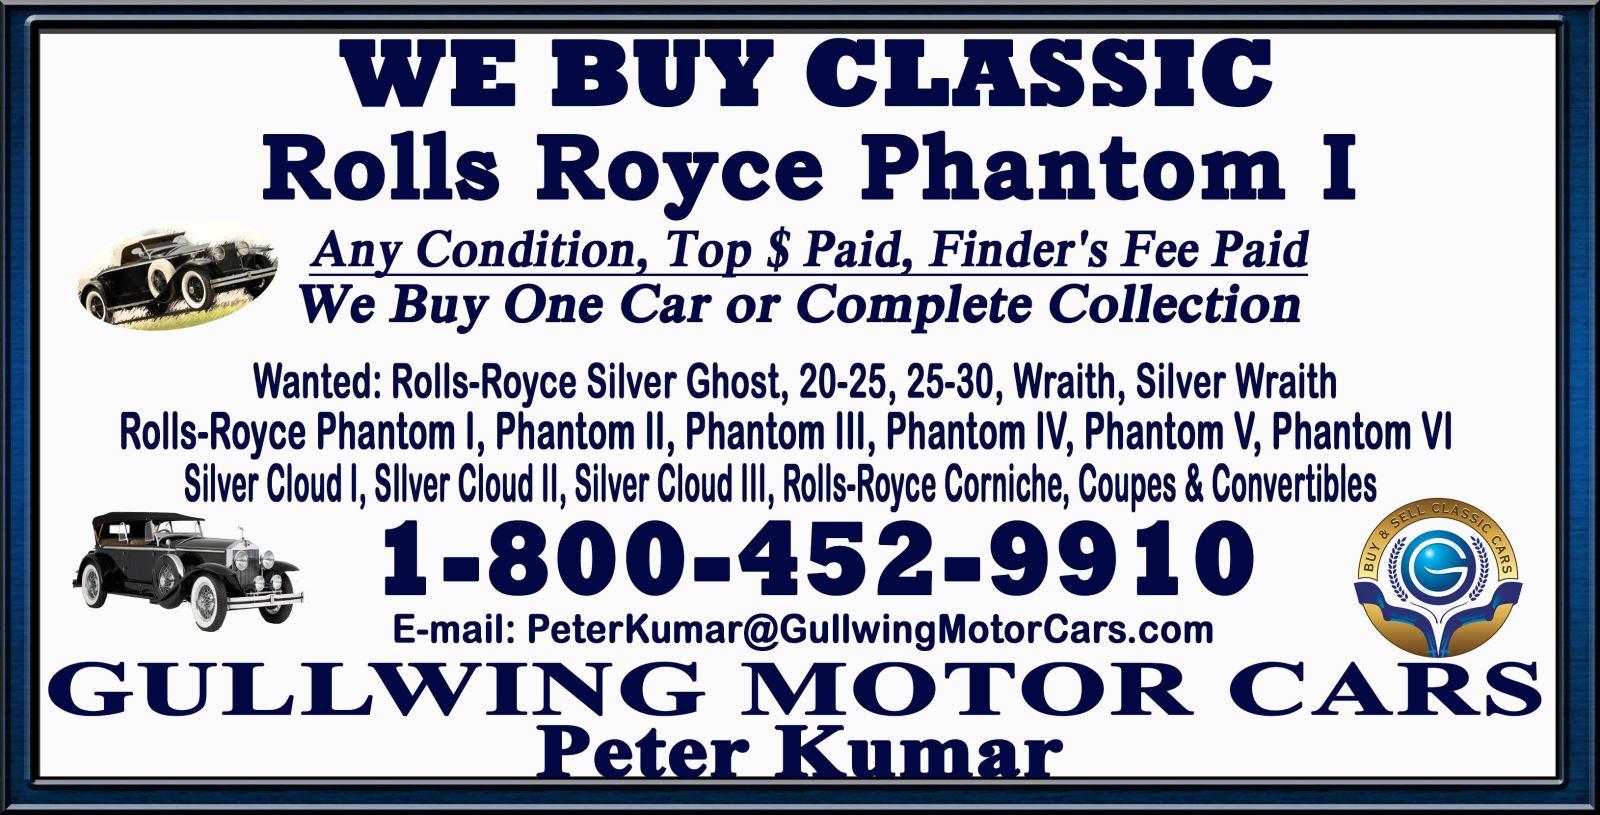 Sell Classic Rolls Royce Phantom I | Call Gullwing Motor if Vintage Rolls Royce Phantom I For Sale